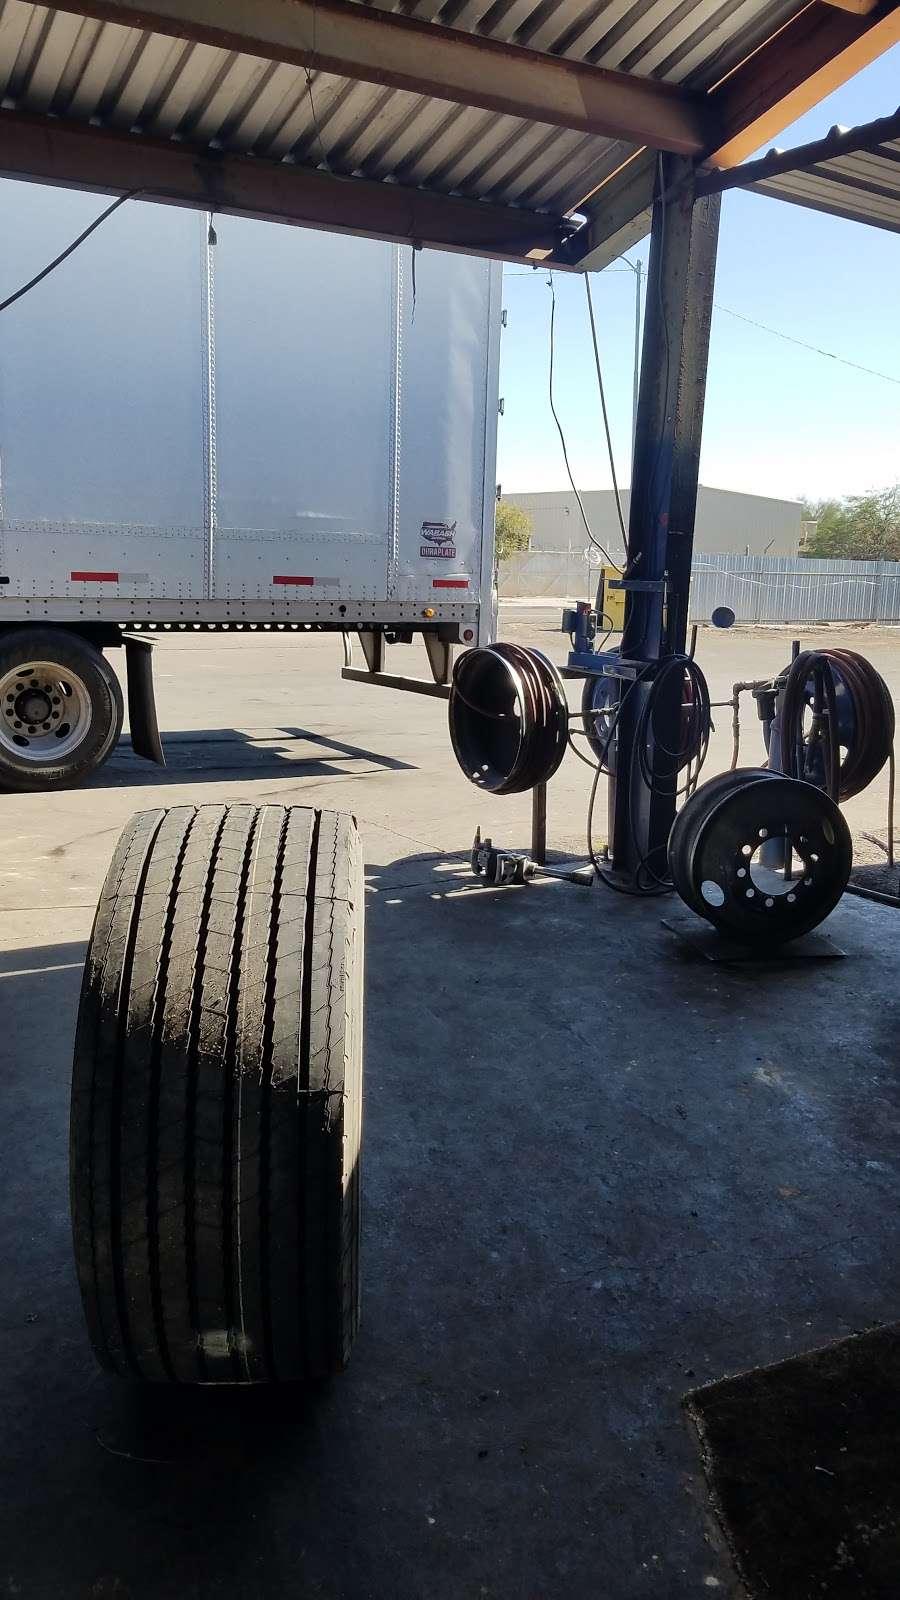 Nunez Tire - car repair    Photo 2 of 7   Address: 3101 W Buckeye Rd, Phoenix, AZ 85009, USA   Phone: (602) 455-8709